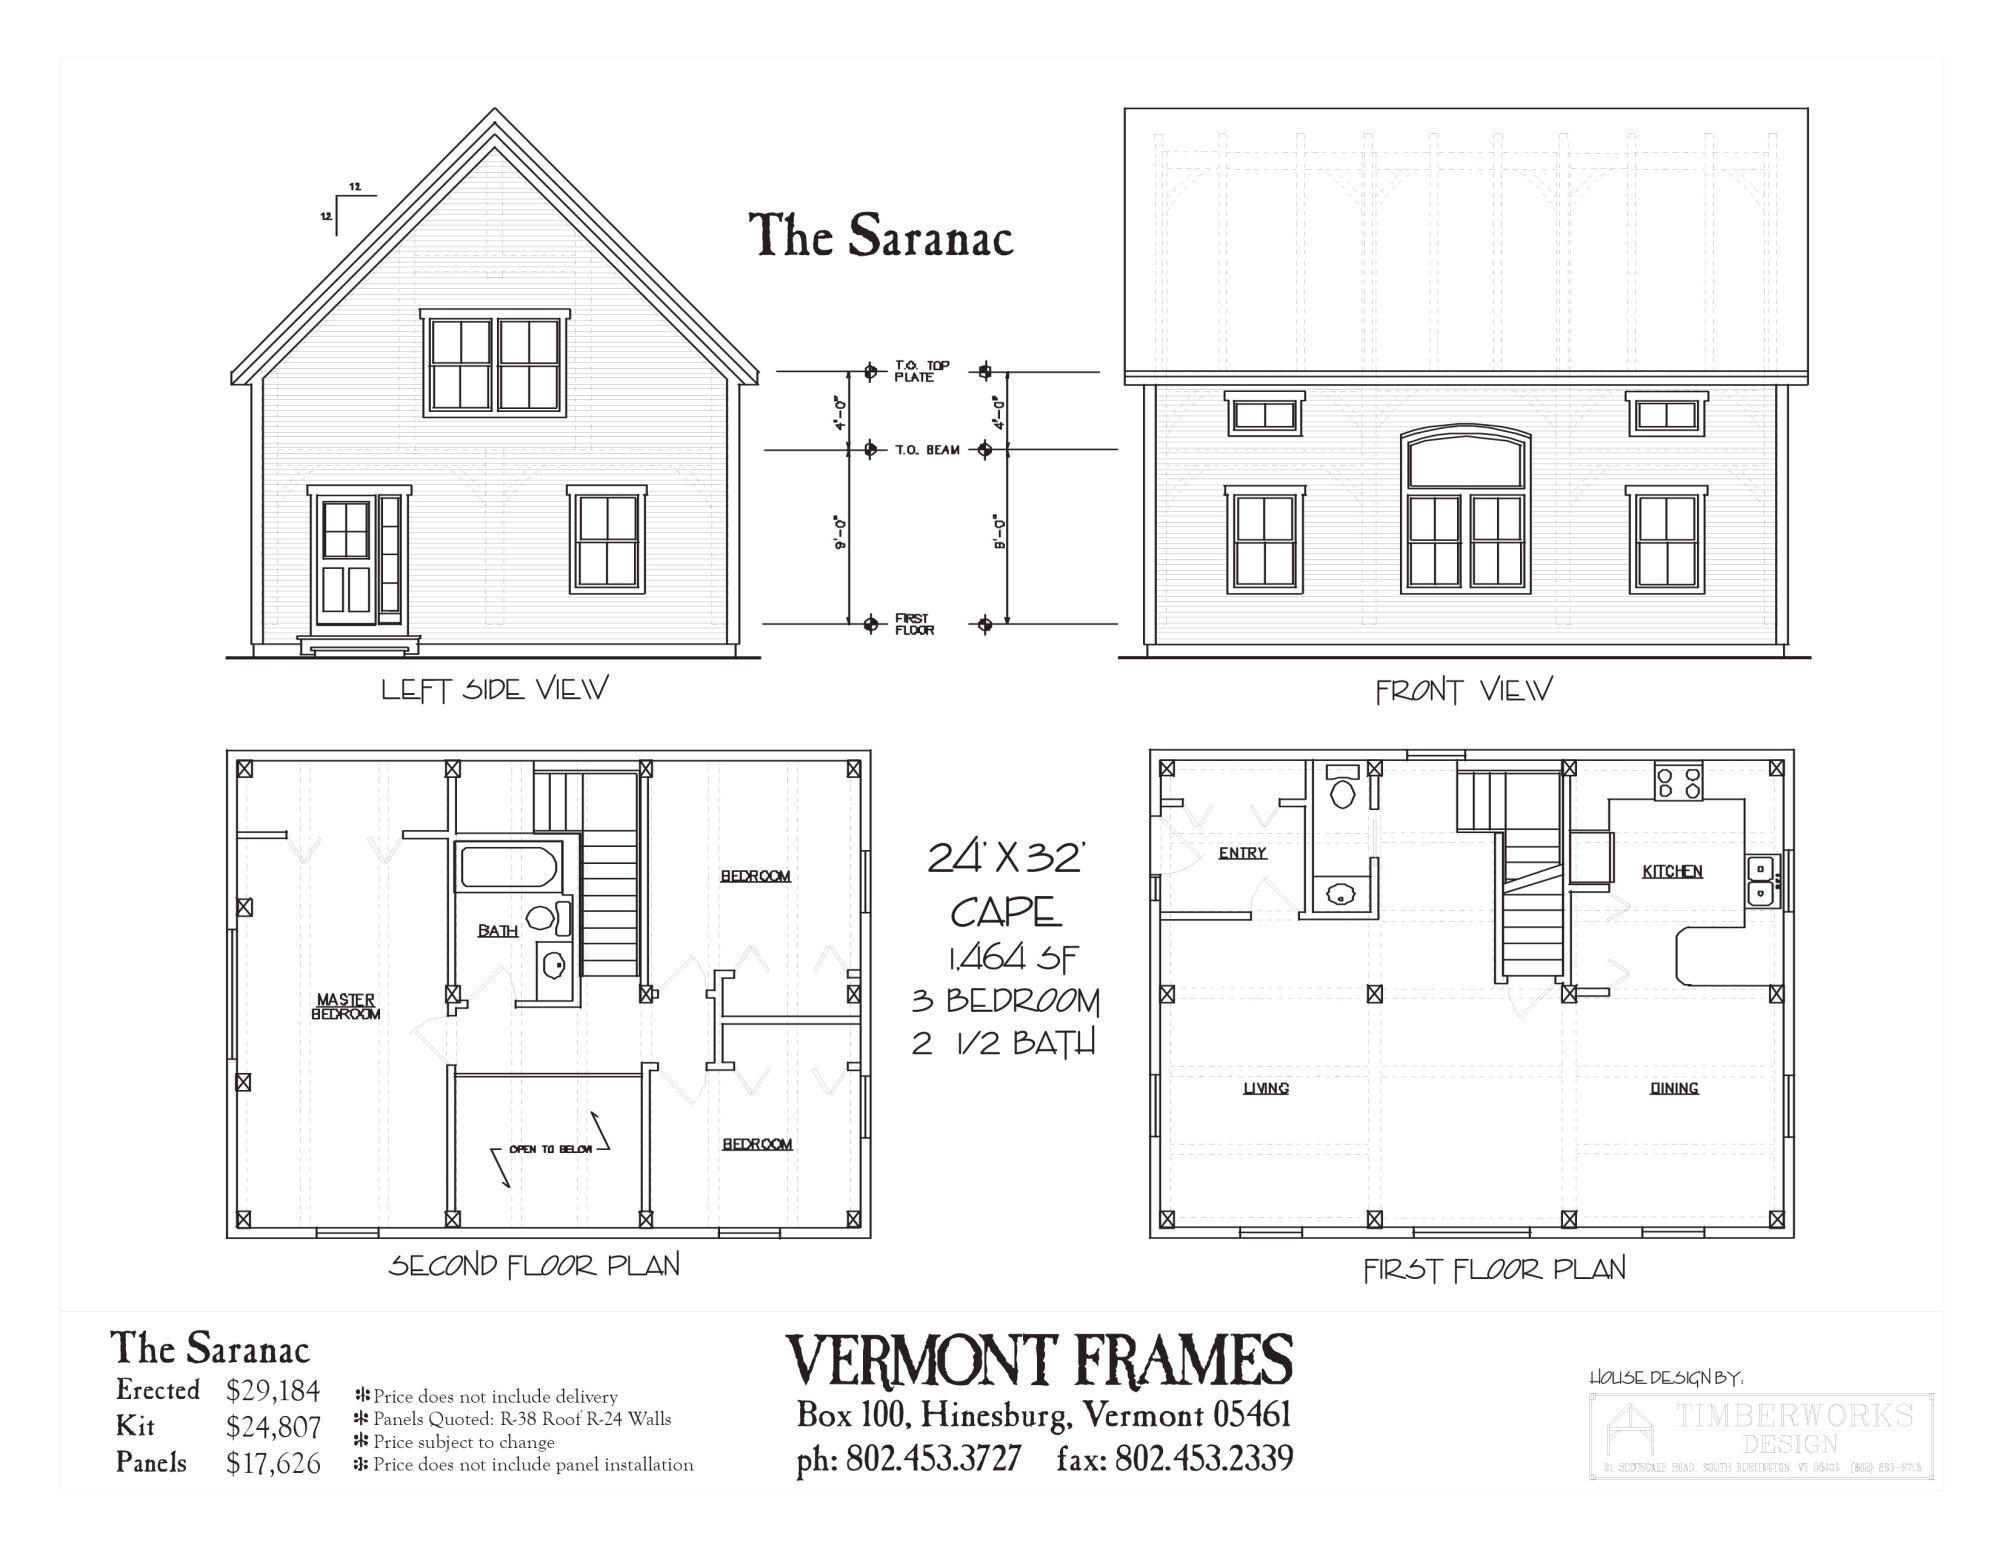 Saranac Cape Timber Frame Home Plans Timber Frame Homes House Plans